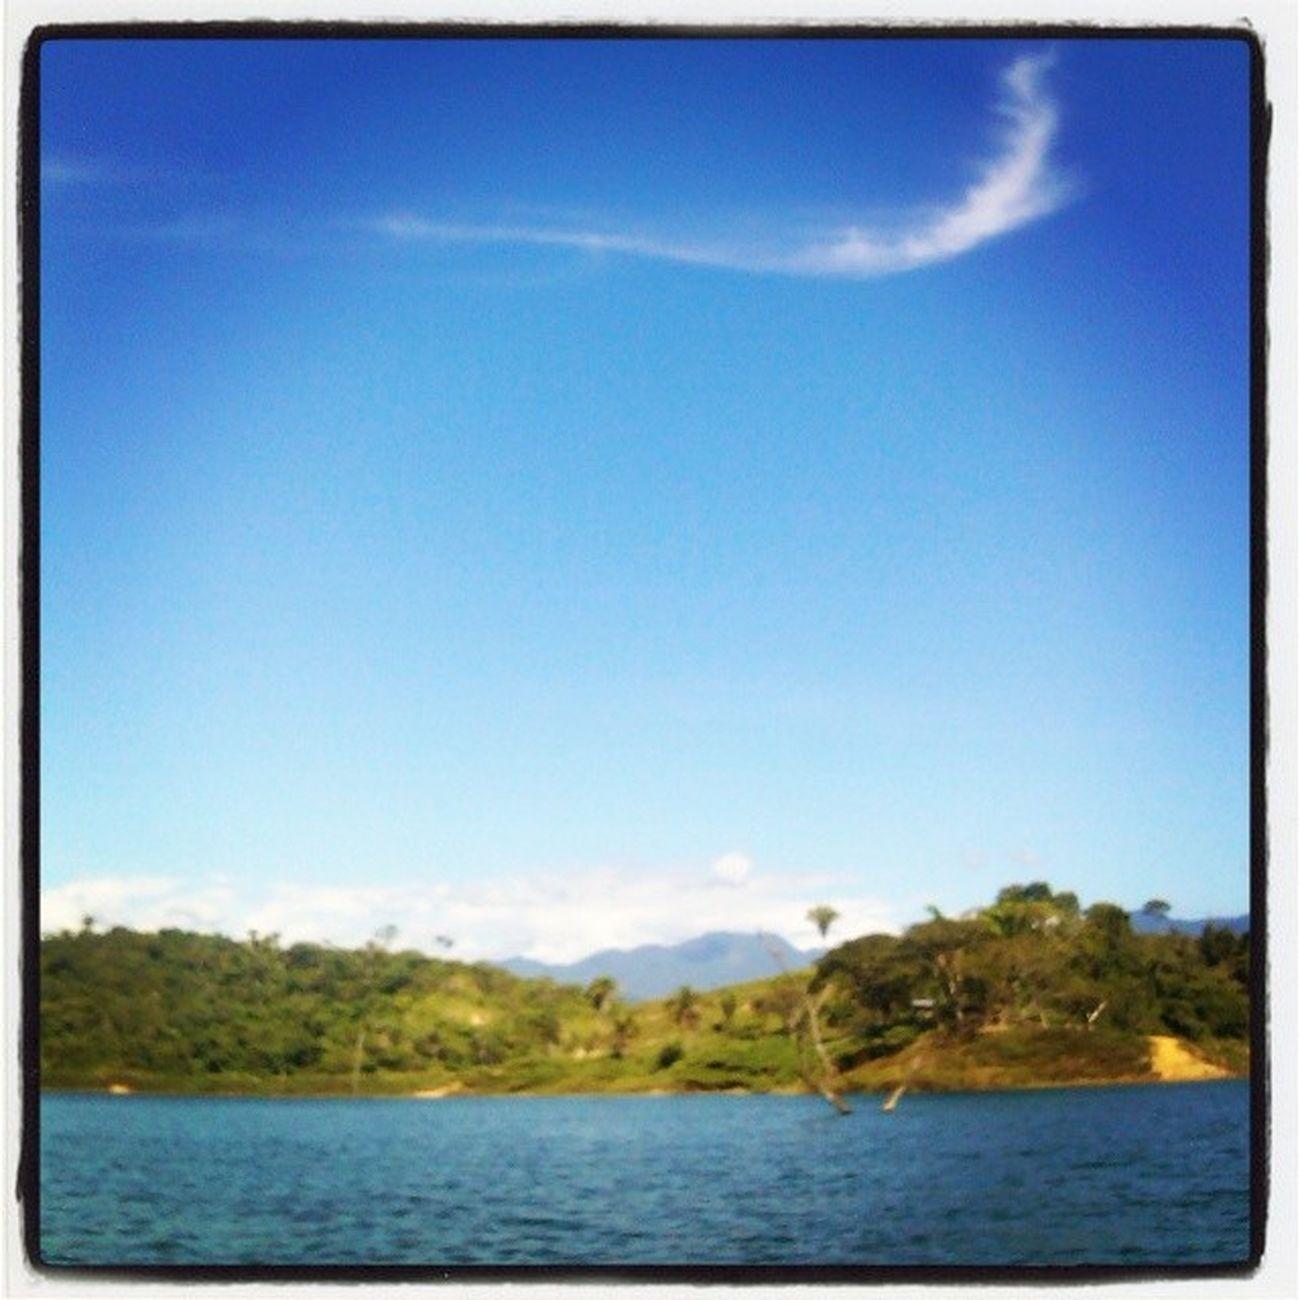 Paisaje Instavenezuela Represas Venezuela pesca